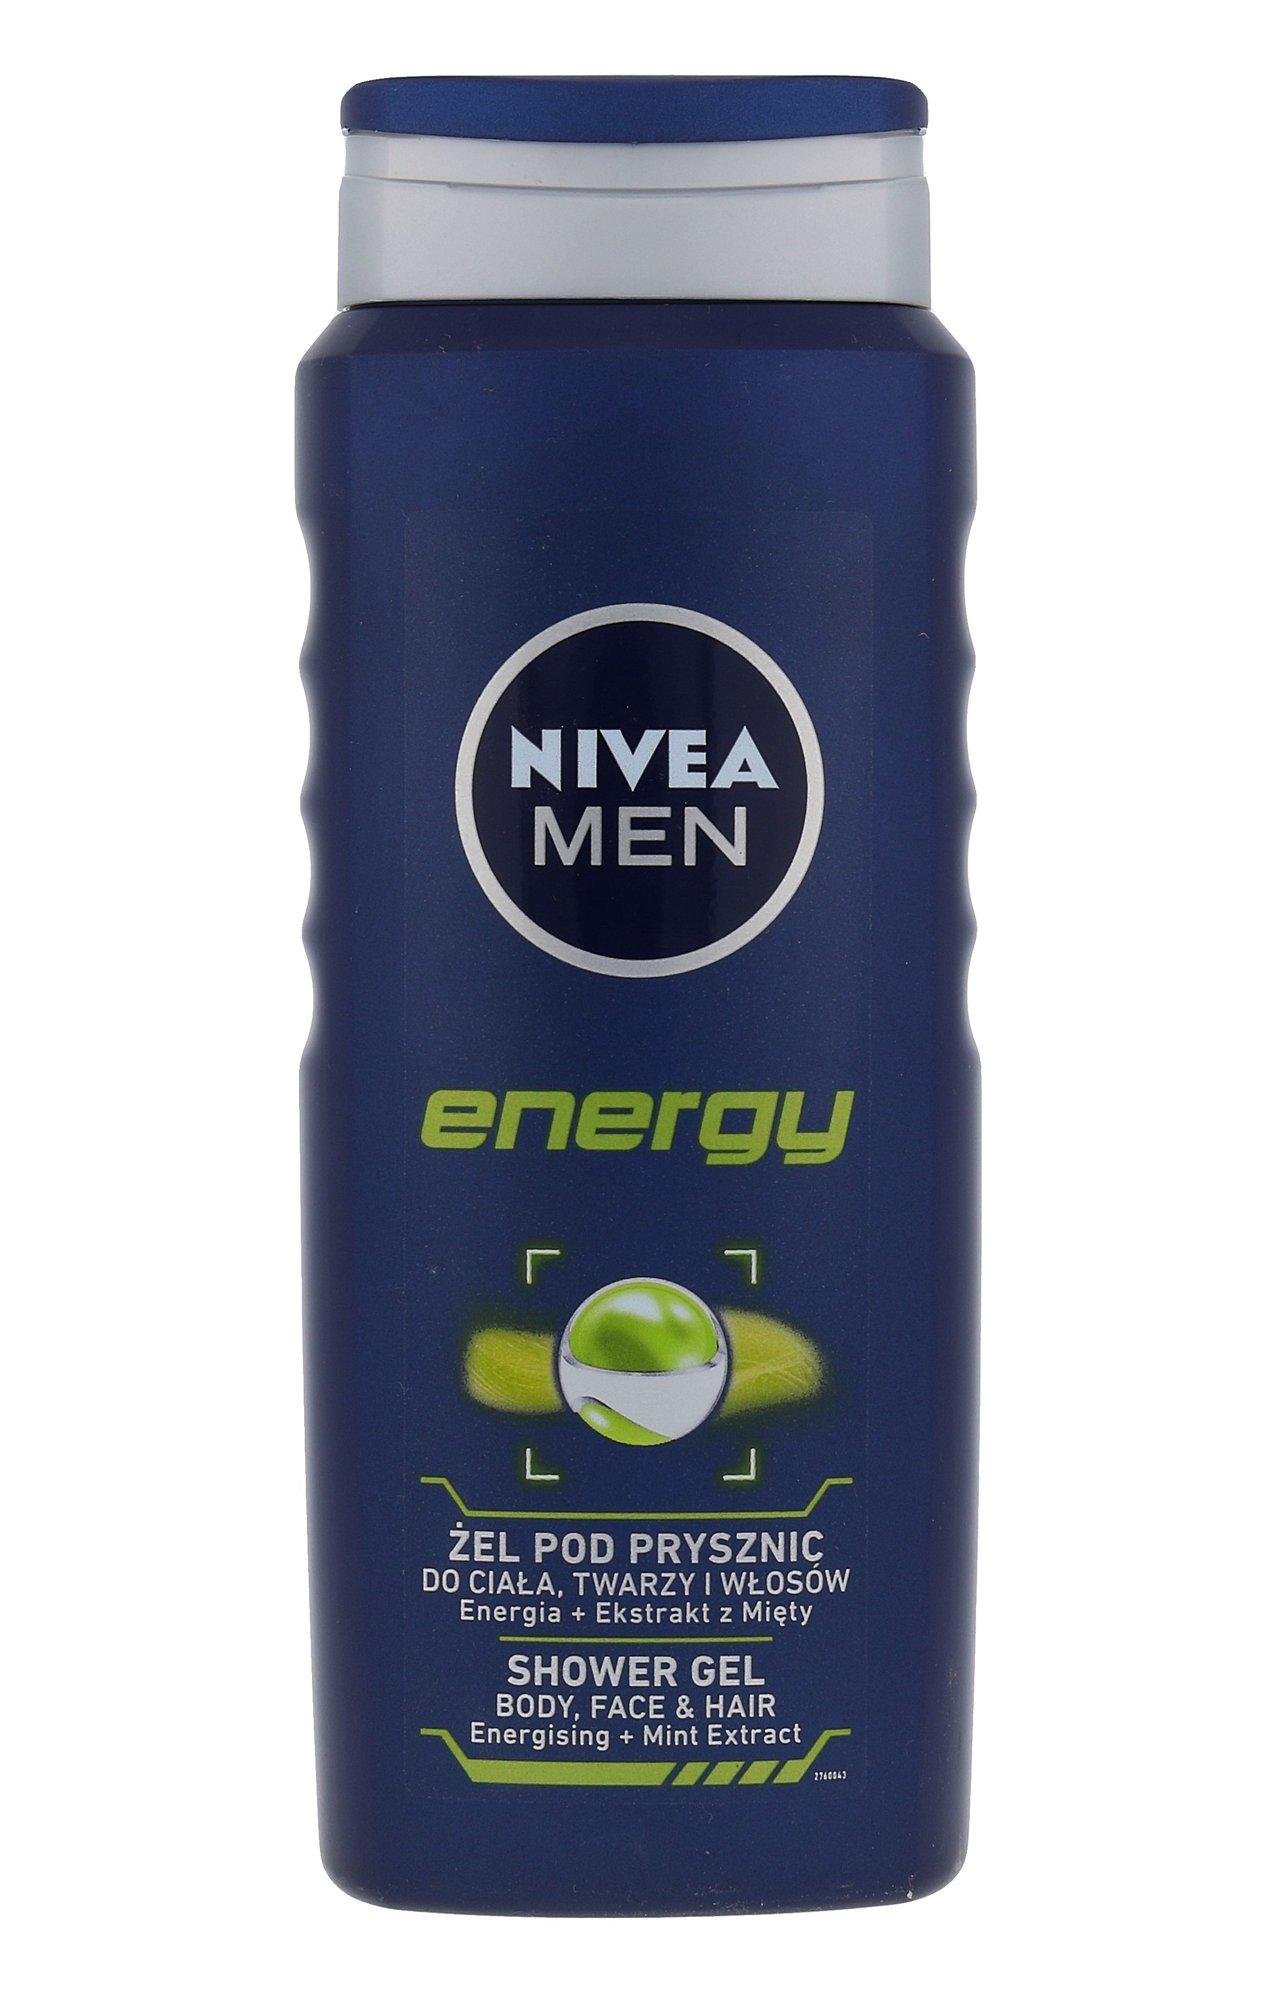 Nivea Men Energy Cosmetic 500ml